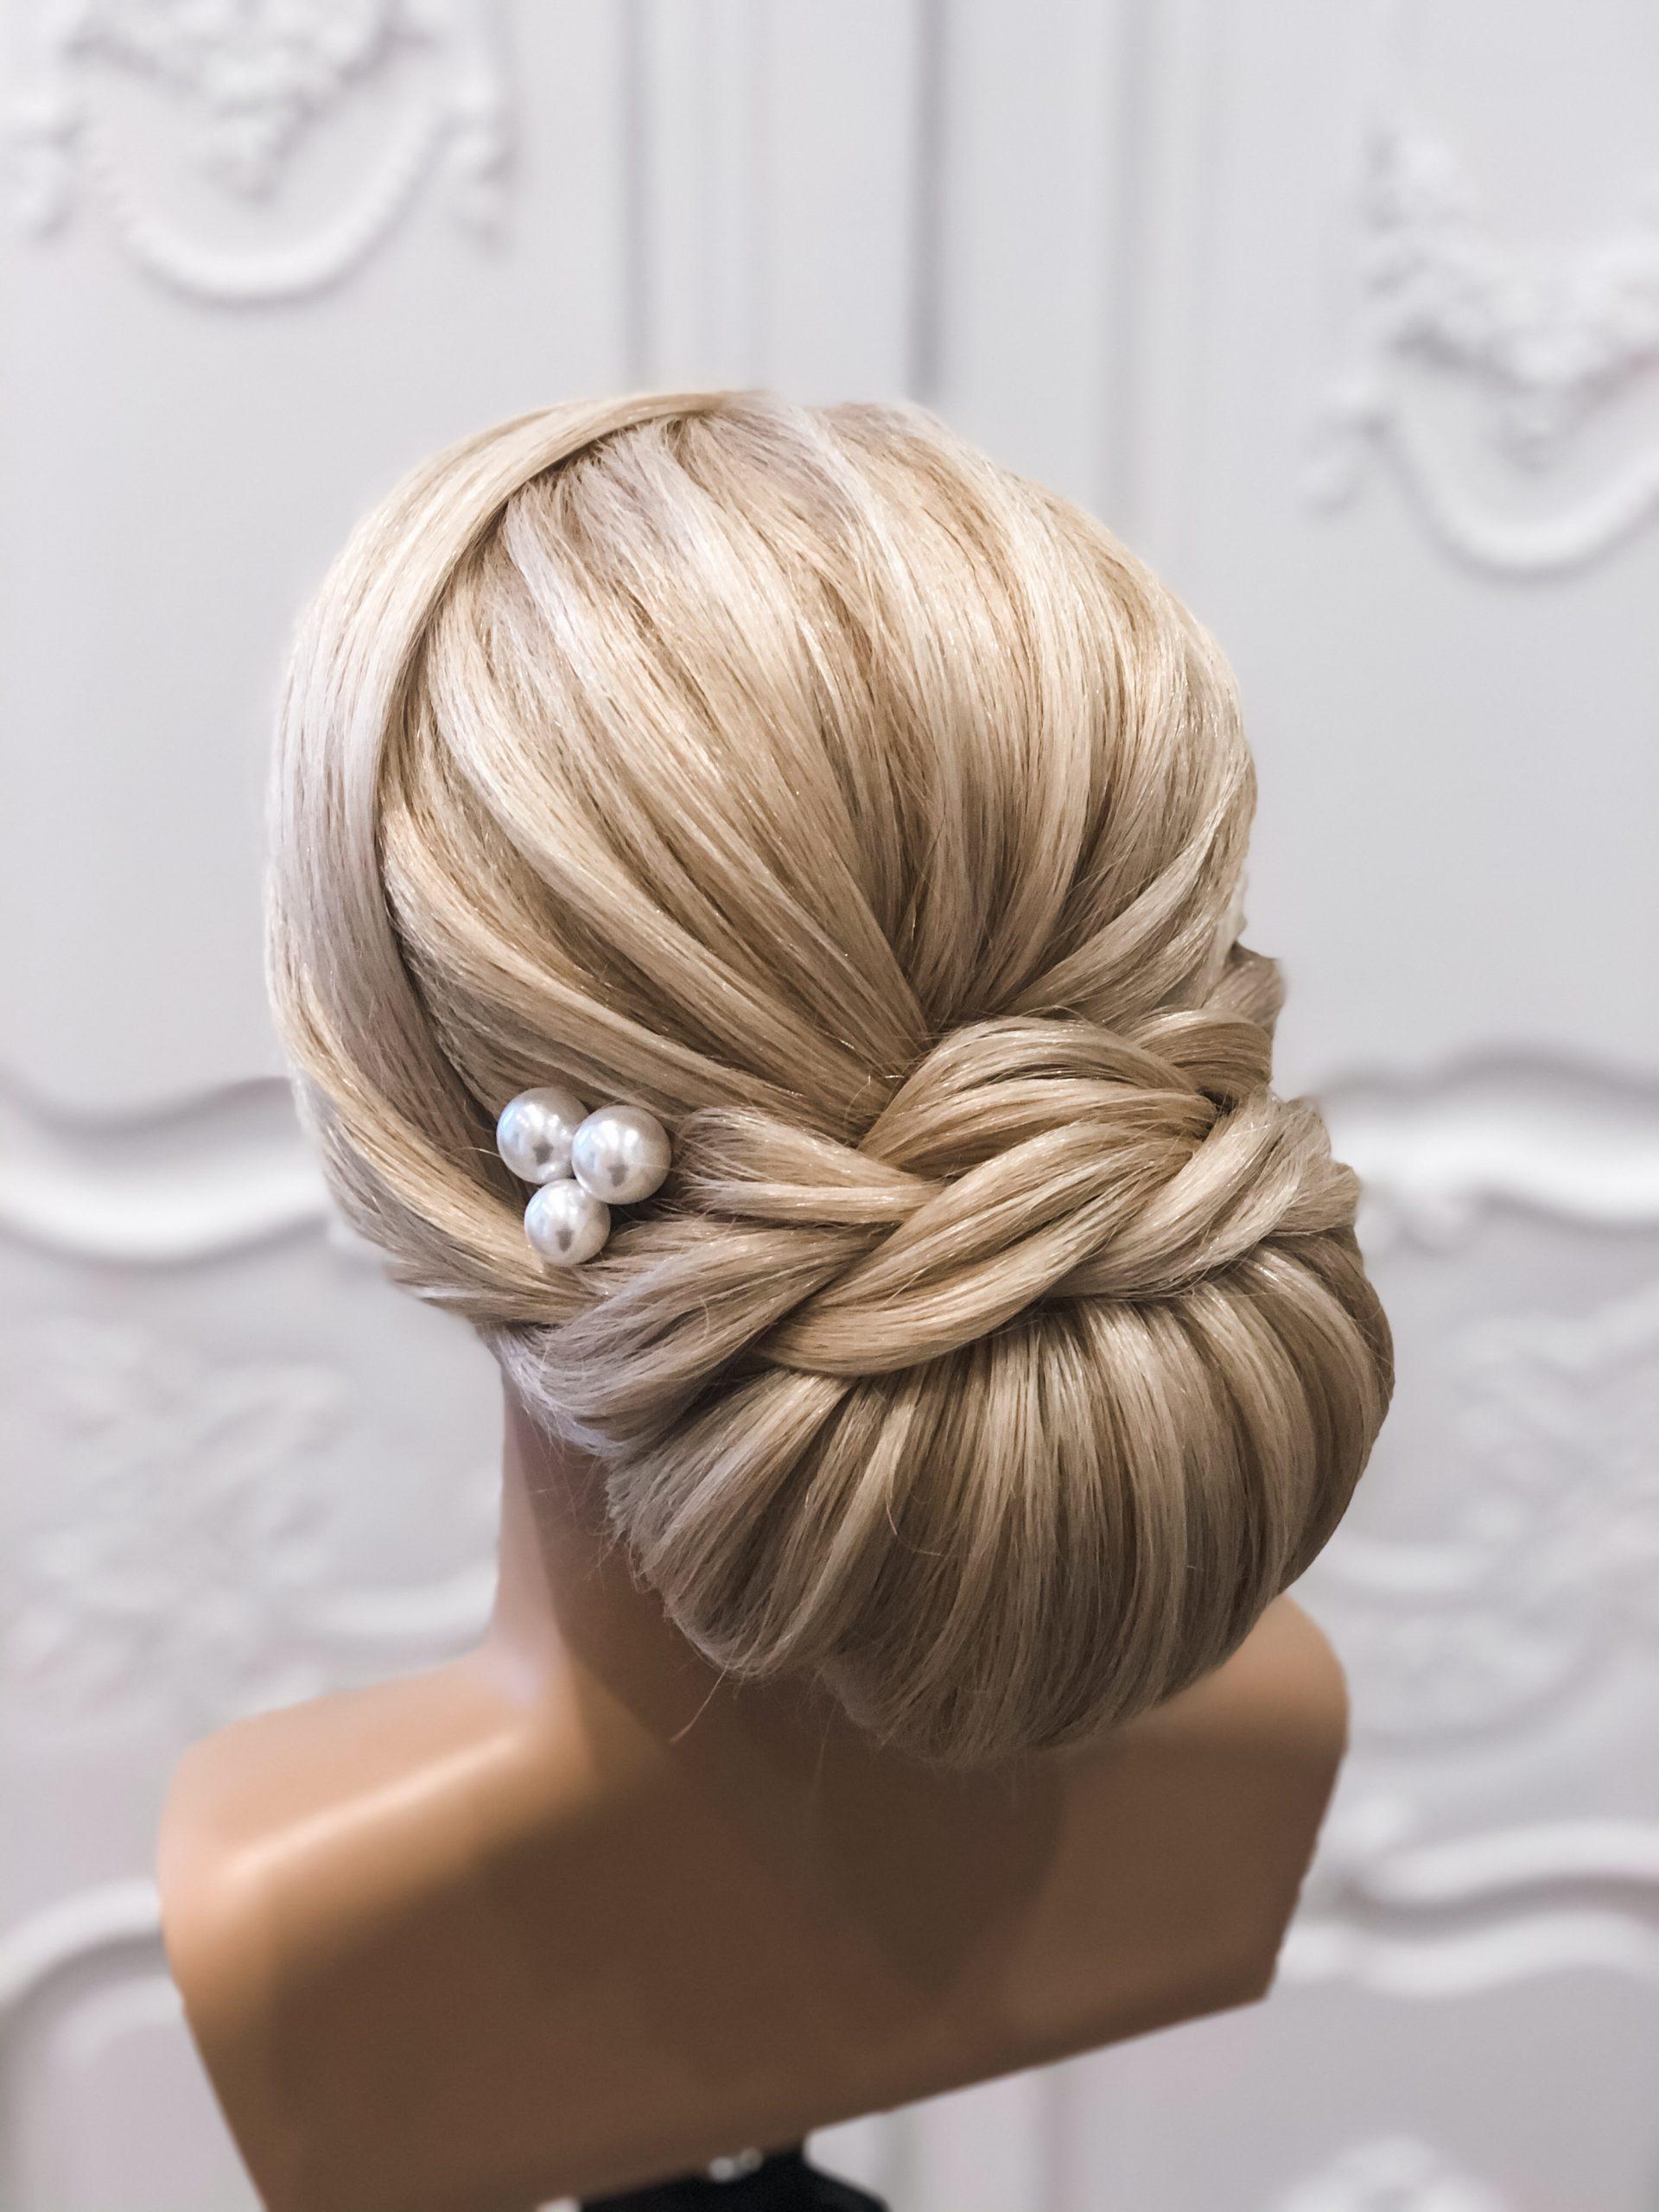 Bruidskapselcursus - bruidskapsel cursus - Hairdo by Mijntje